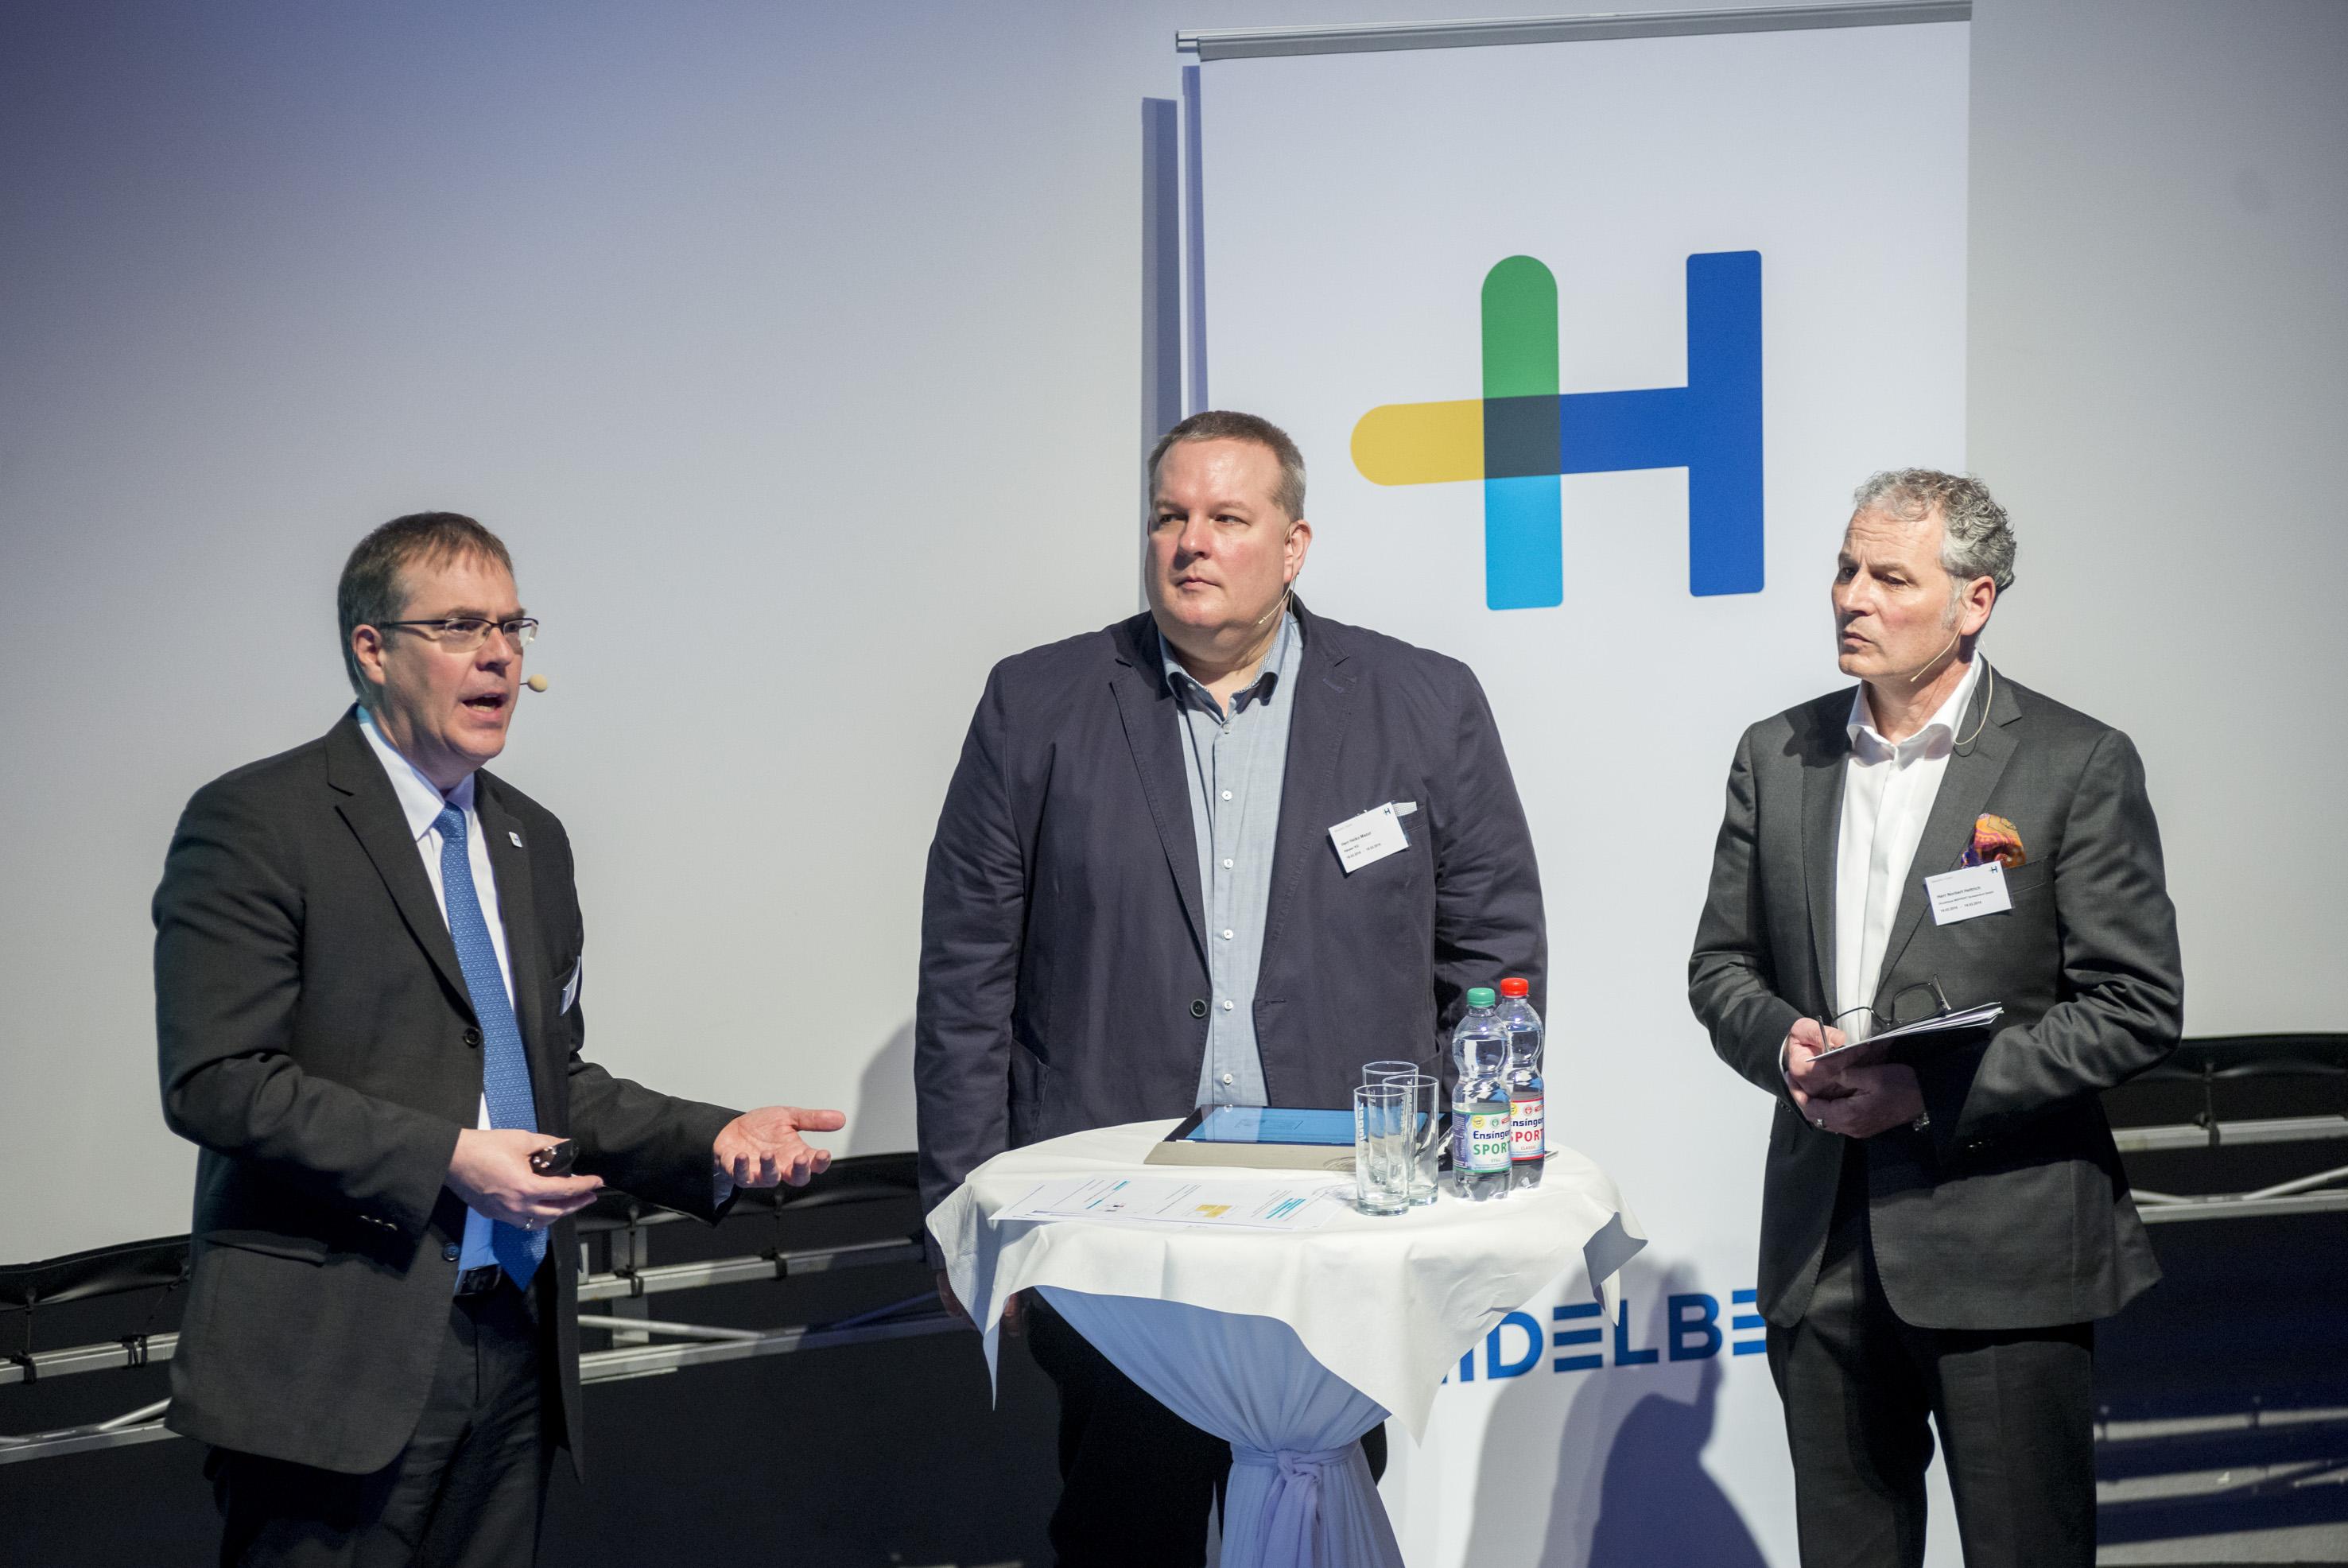 From left: Harald Weimer, Heiko Mazur and Norbert Hettich. Photo: Heidelberg